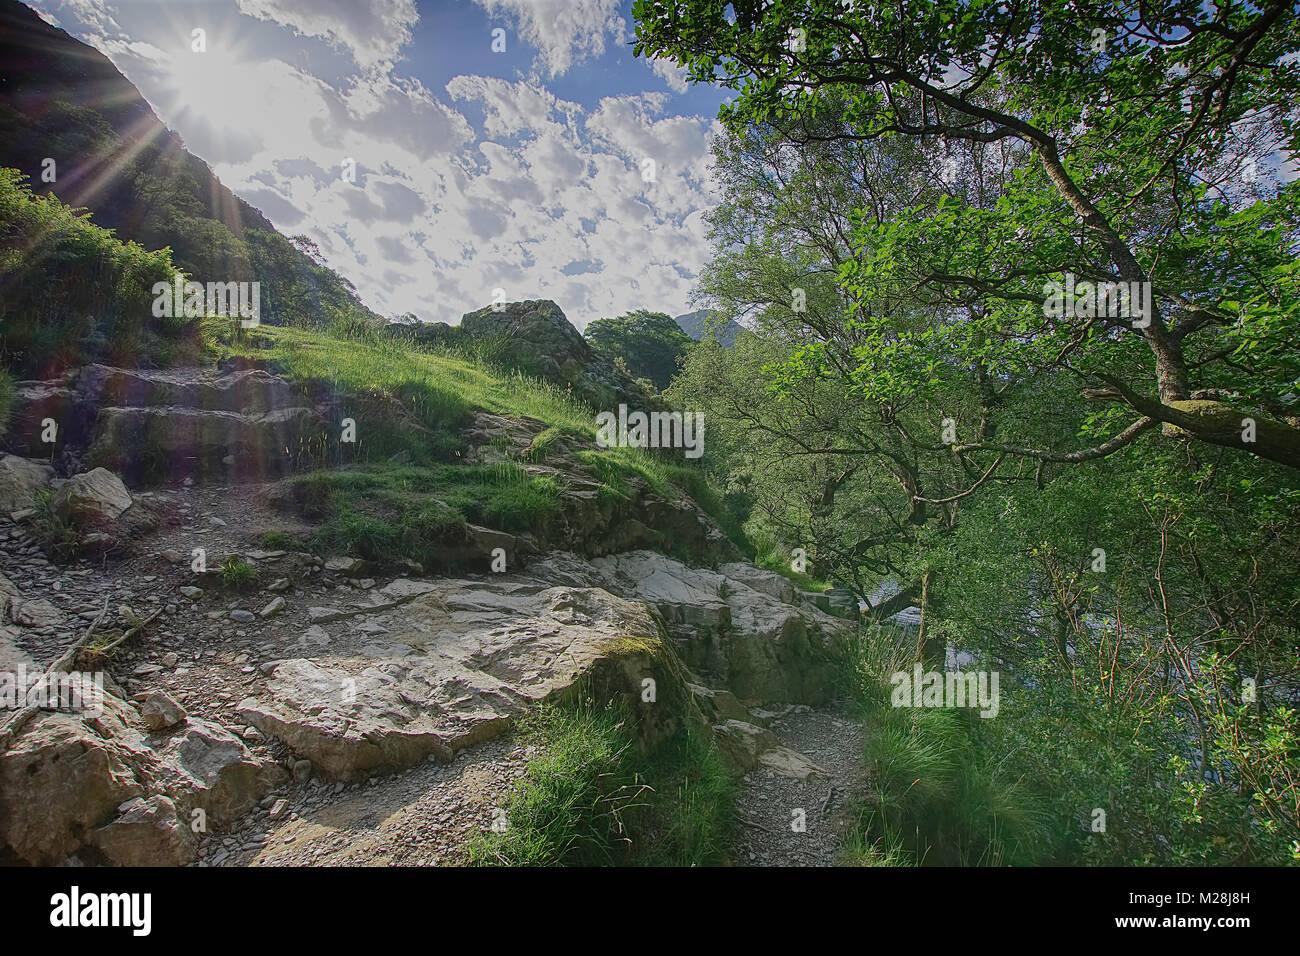 Pfad um buttermere See im Nationalpark Lake District, Cumbria, Vereinigtes Königreich, Frühling. Landschaft Stockbild